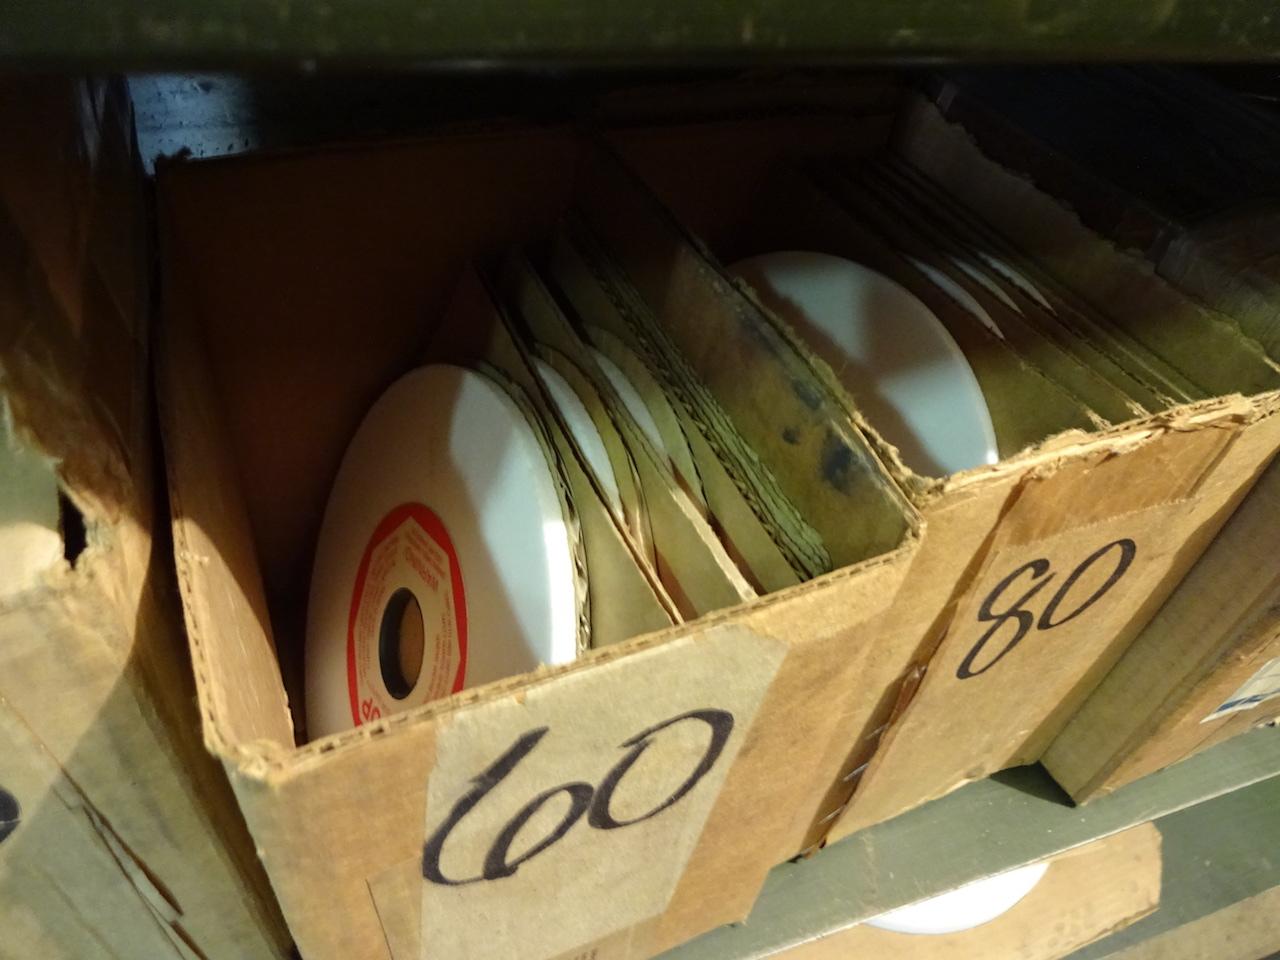 Lot 31 - LOT: Assorted Grinding Wheels on Shelf